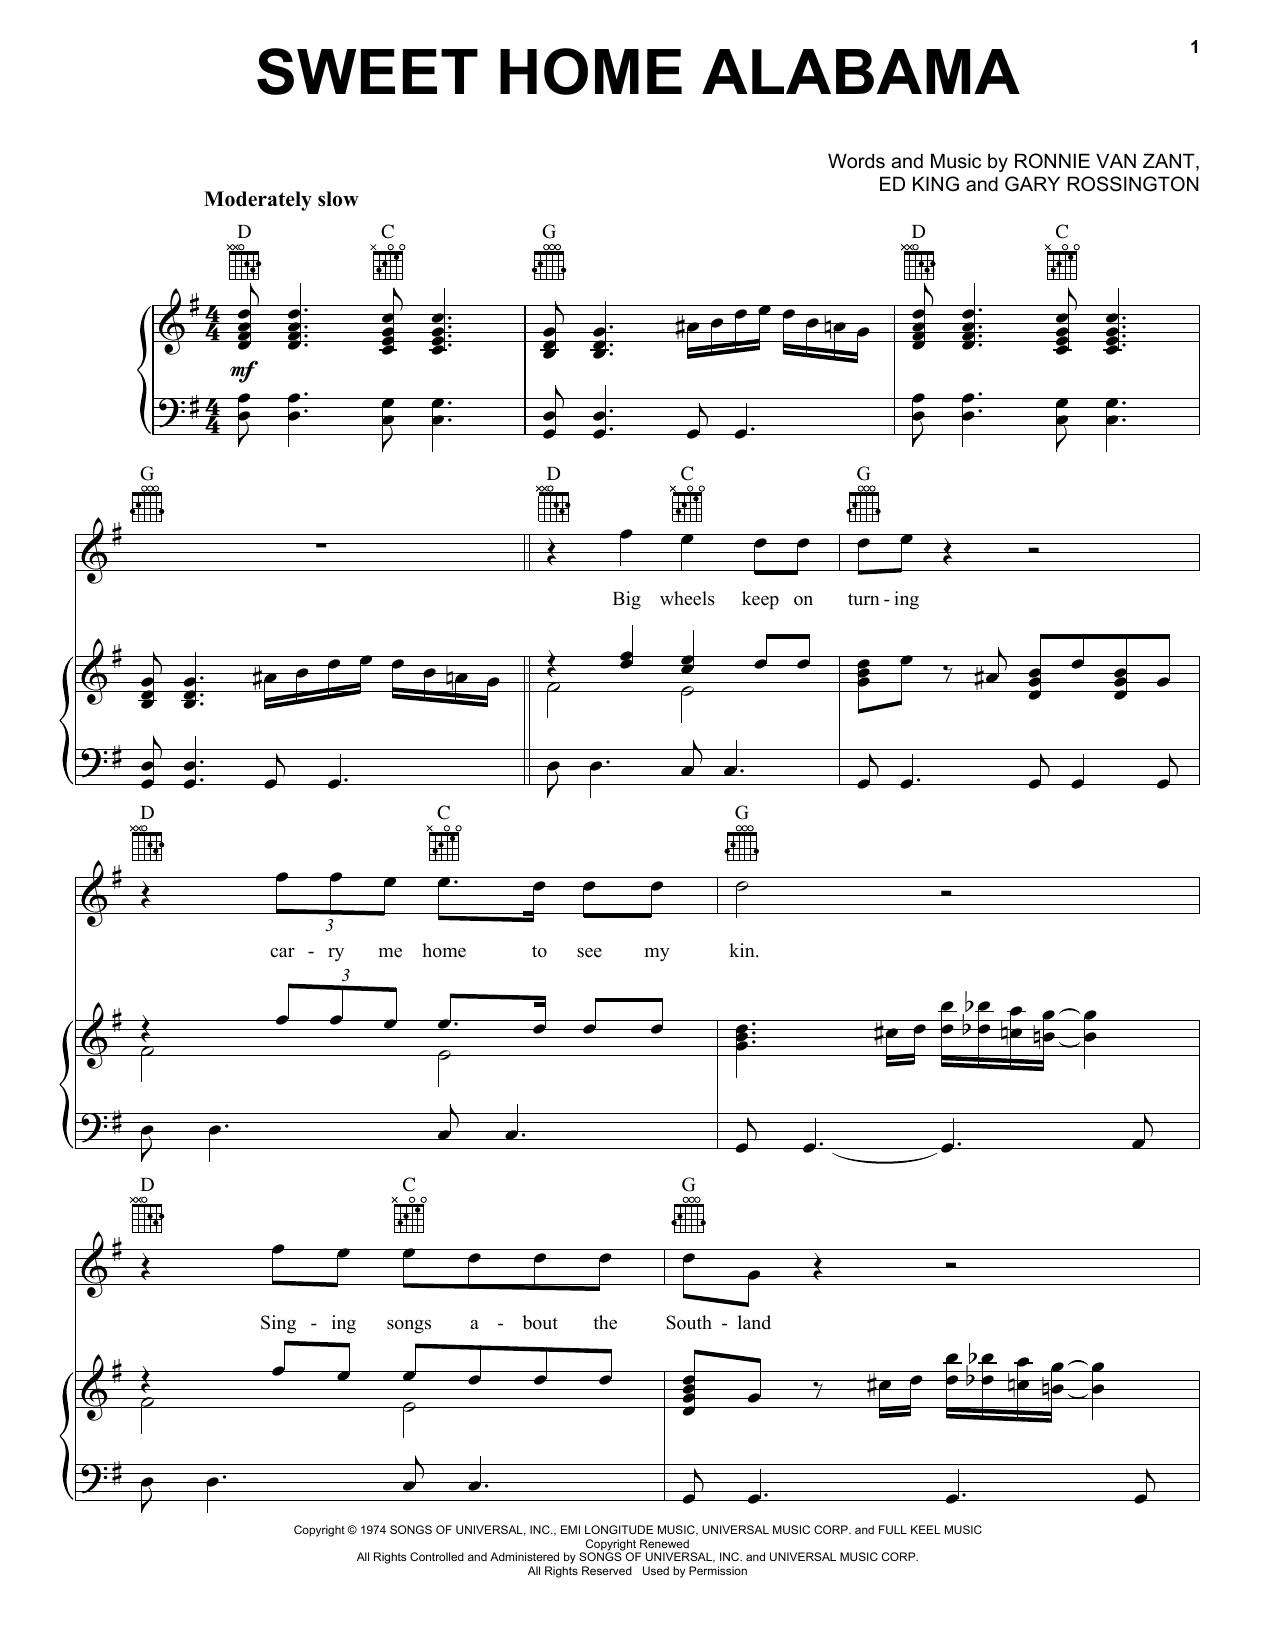 Jun 24, 1974· where the skies are so blue. Lynyrd Skynyrd Sweet Home Alabama Sheet Music Notes Chords Lyrics Chords Download Rock 48228 Pdf